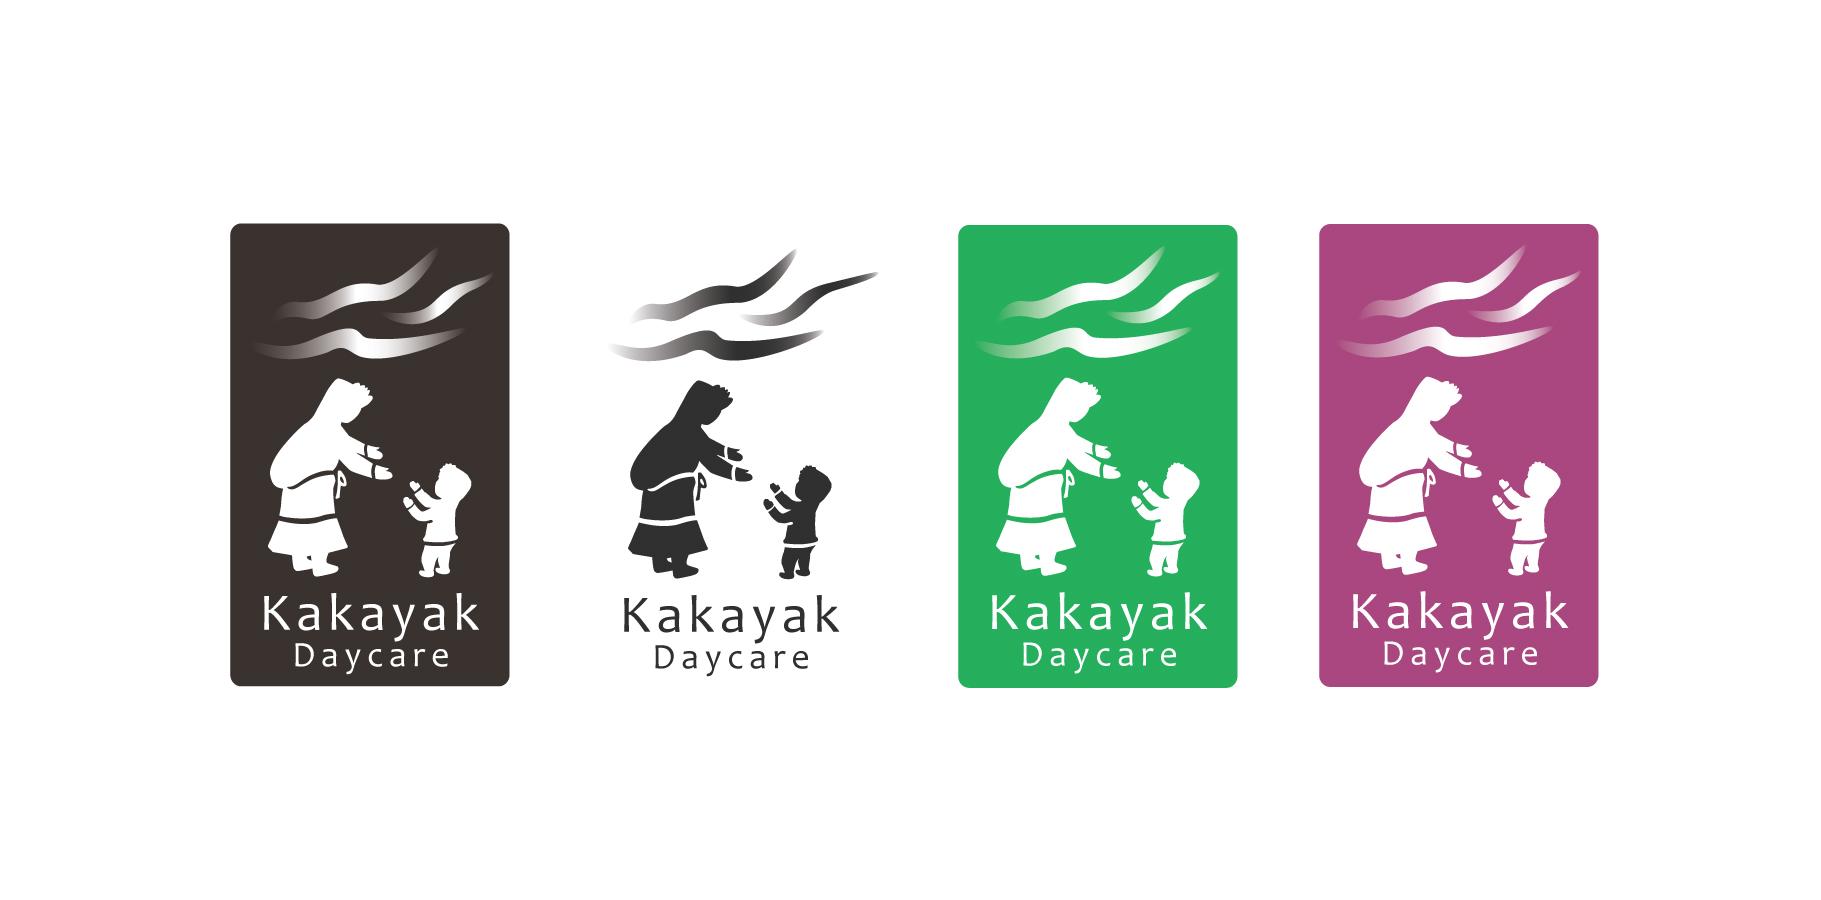 Kakayak-Daycare-logo-alternates.jpg